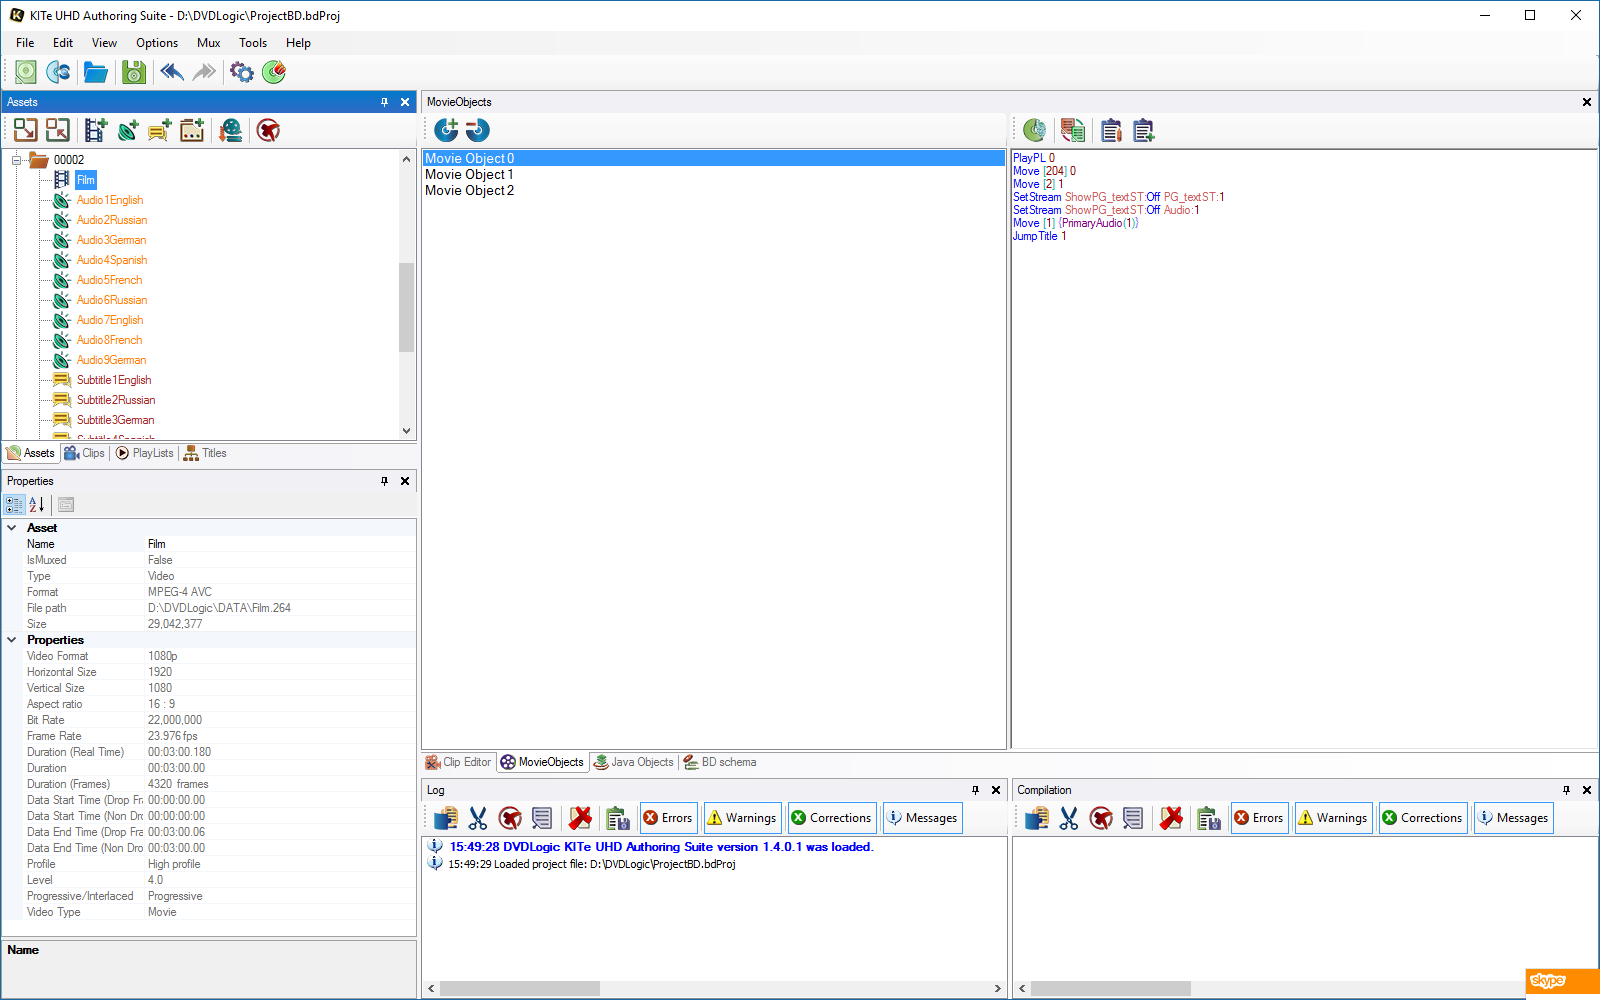 HDMV commands editor